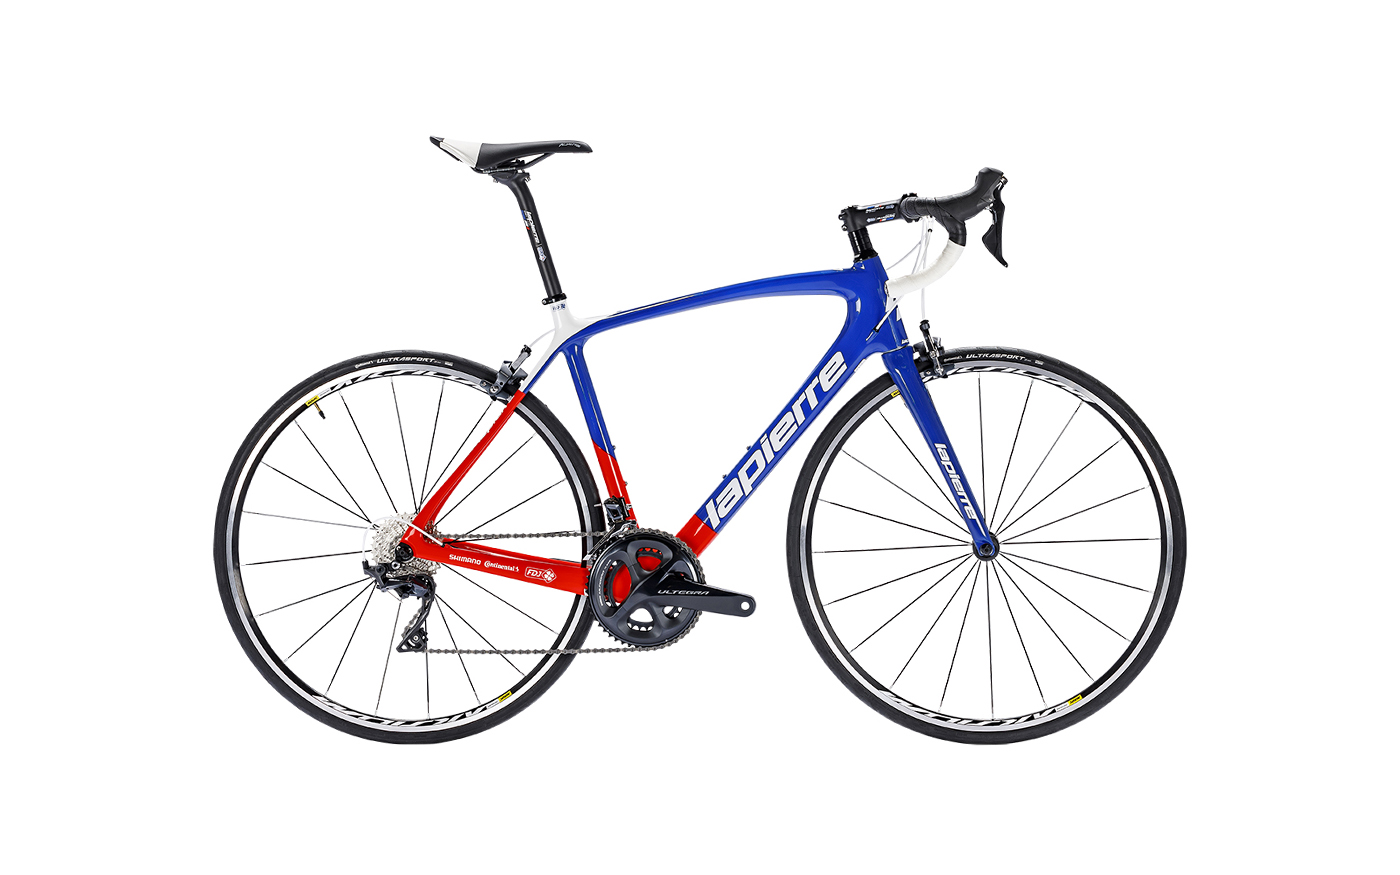 Bicykel LAPIERRE SENSIUM 600 FDJ CP 2018